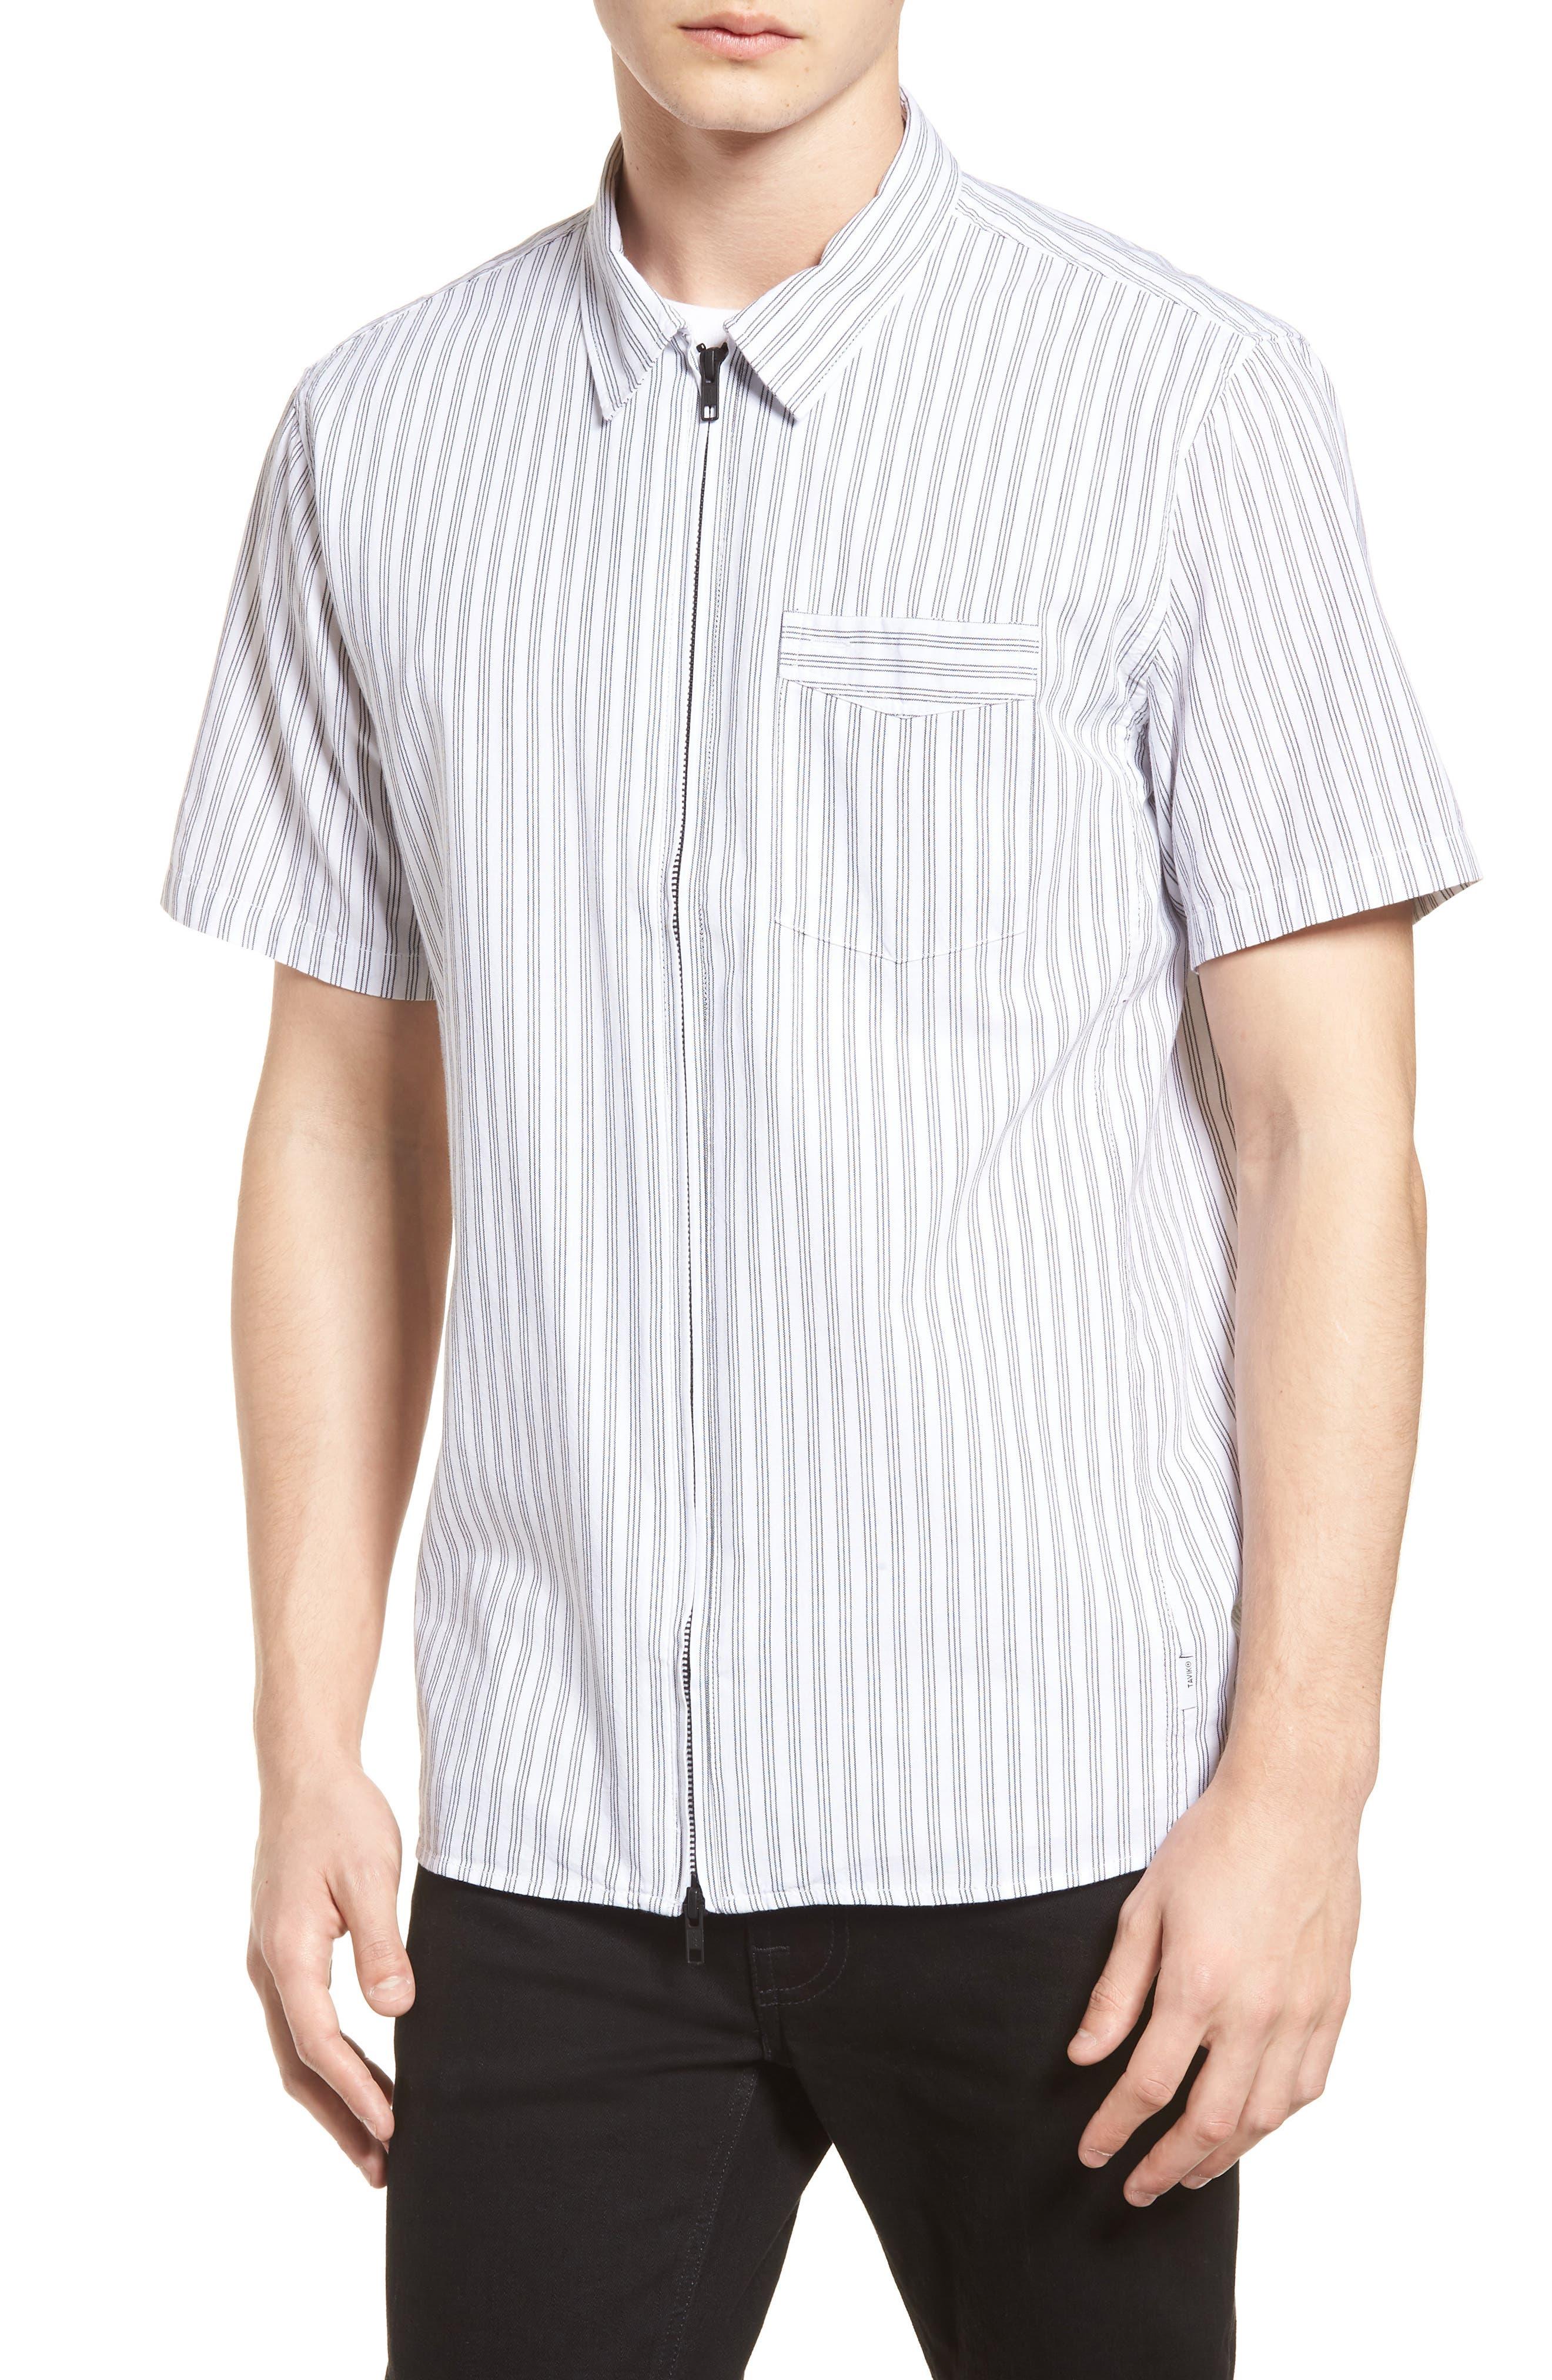 Rollins Woven Shirt,                             Main thumbnail 1, color,                             Black/White Stripe